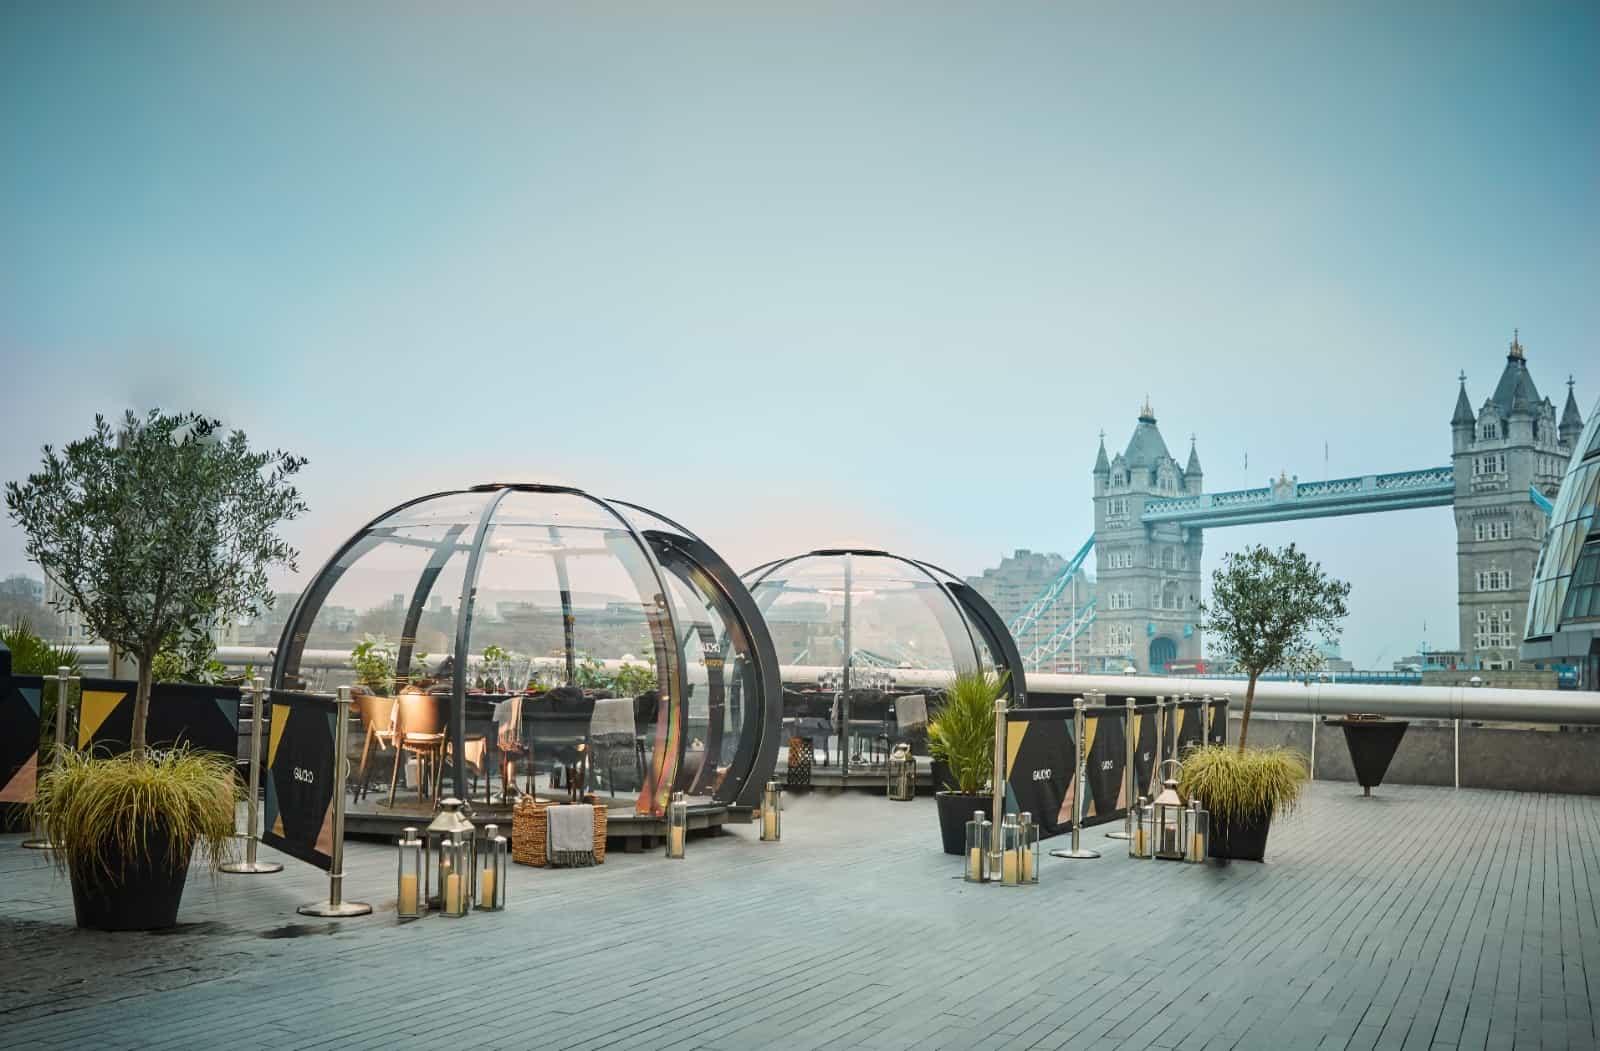 Gaucho Tower Bridge outdoor dining al fresco terrace re-opening 12th april